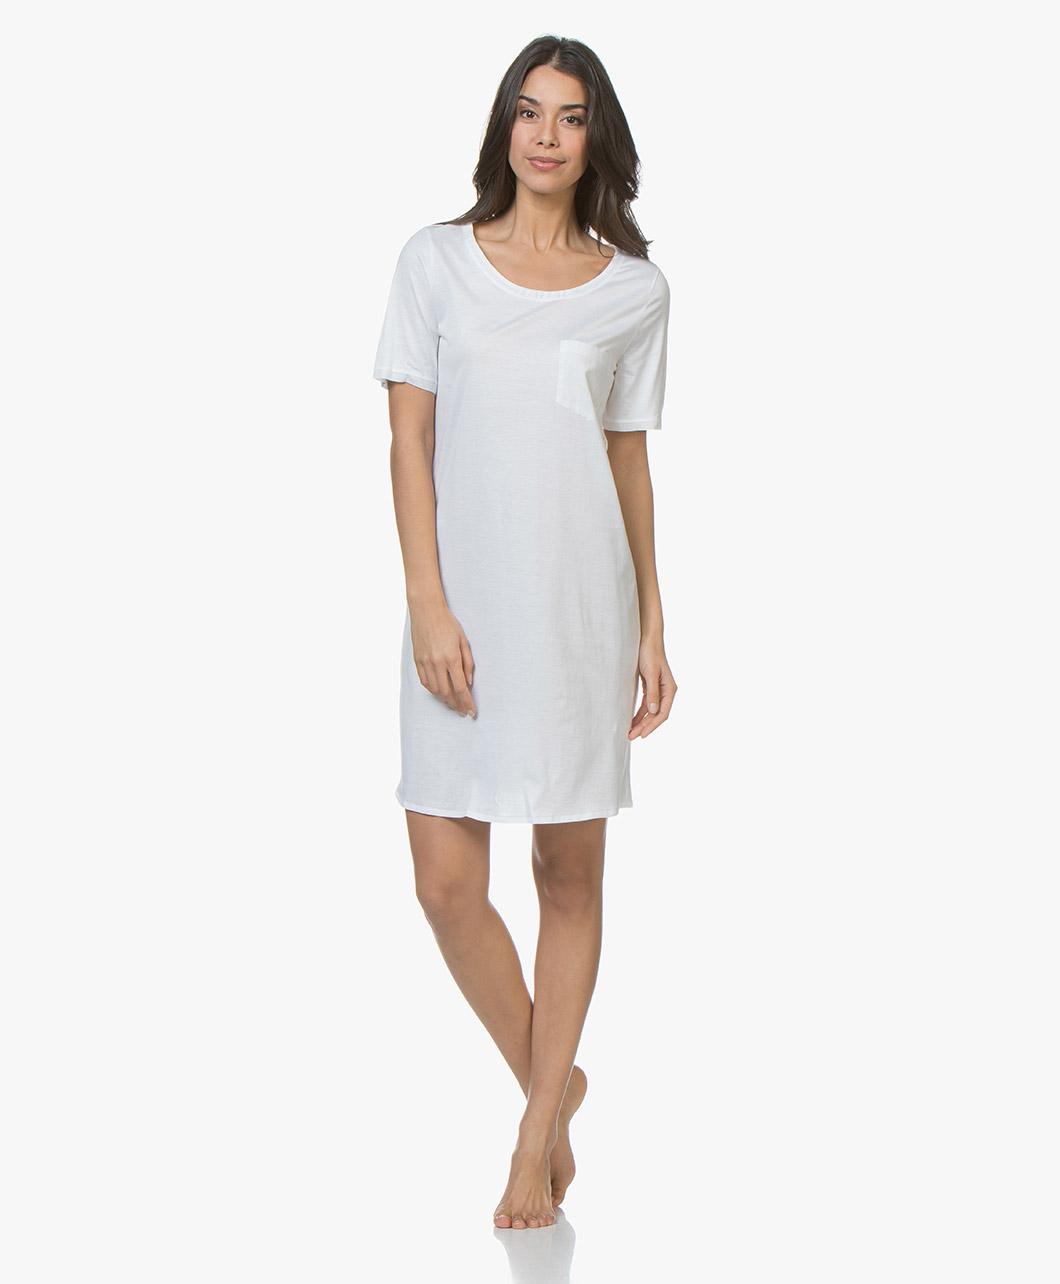 096b060720 HANRO Cotton Deluxe Jersey Nightshirt - White - s slv nightdress ...